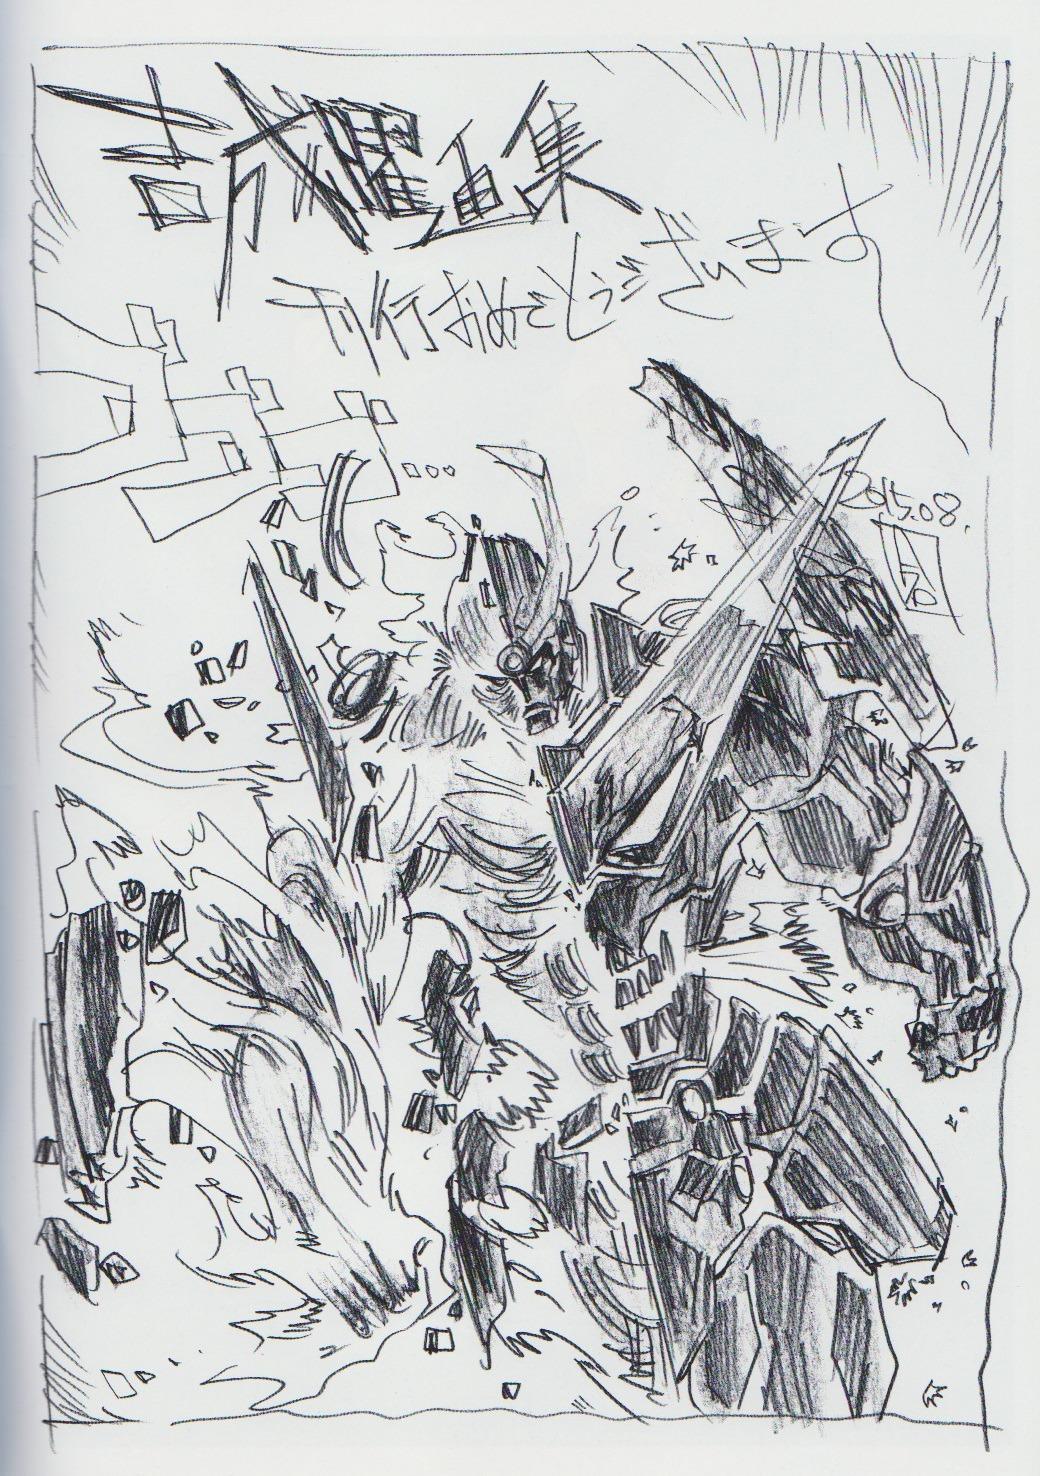 hiroyuki_imaishi illustration presumed tengen_toppa_gurren_lagann